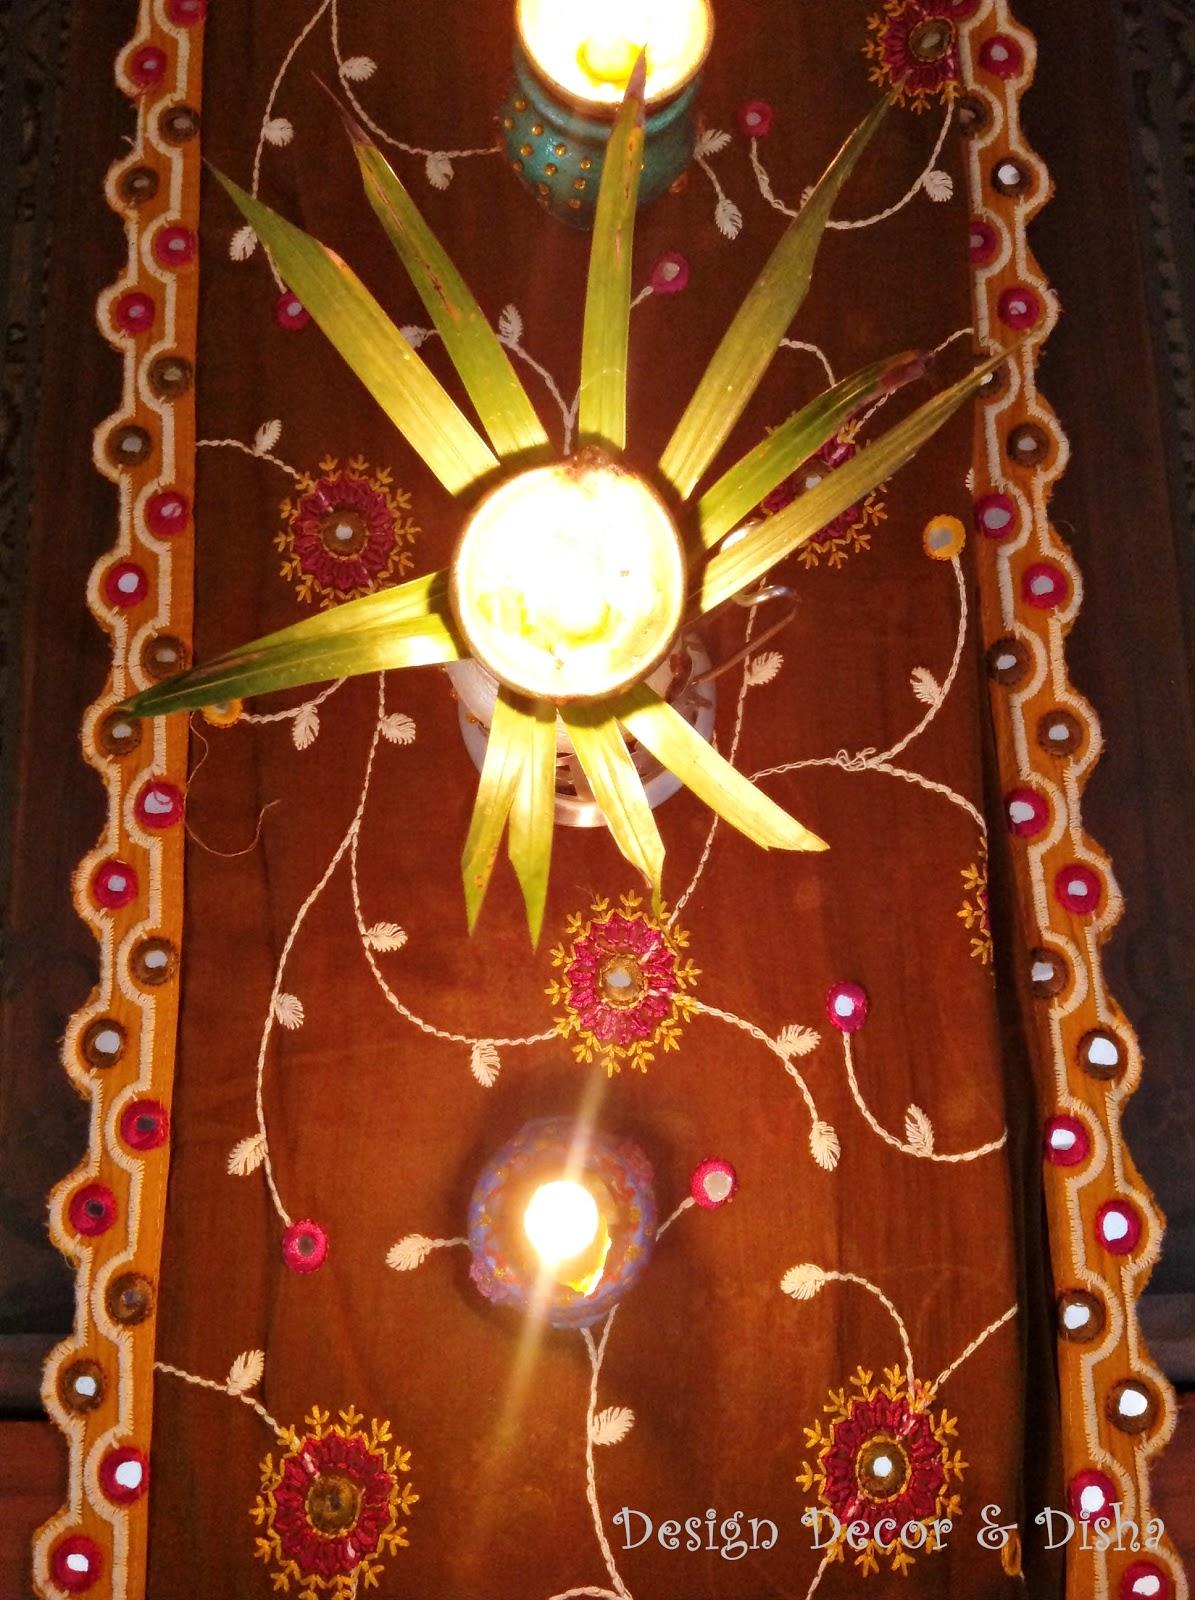 diy home decor ideas for diwali 128 best diwali decor images on design decor disha diwali craft home decor inspiration ii